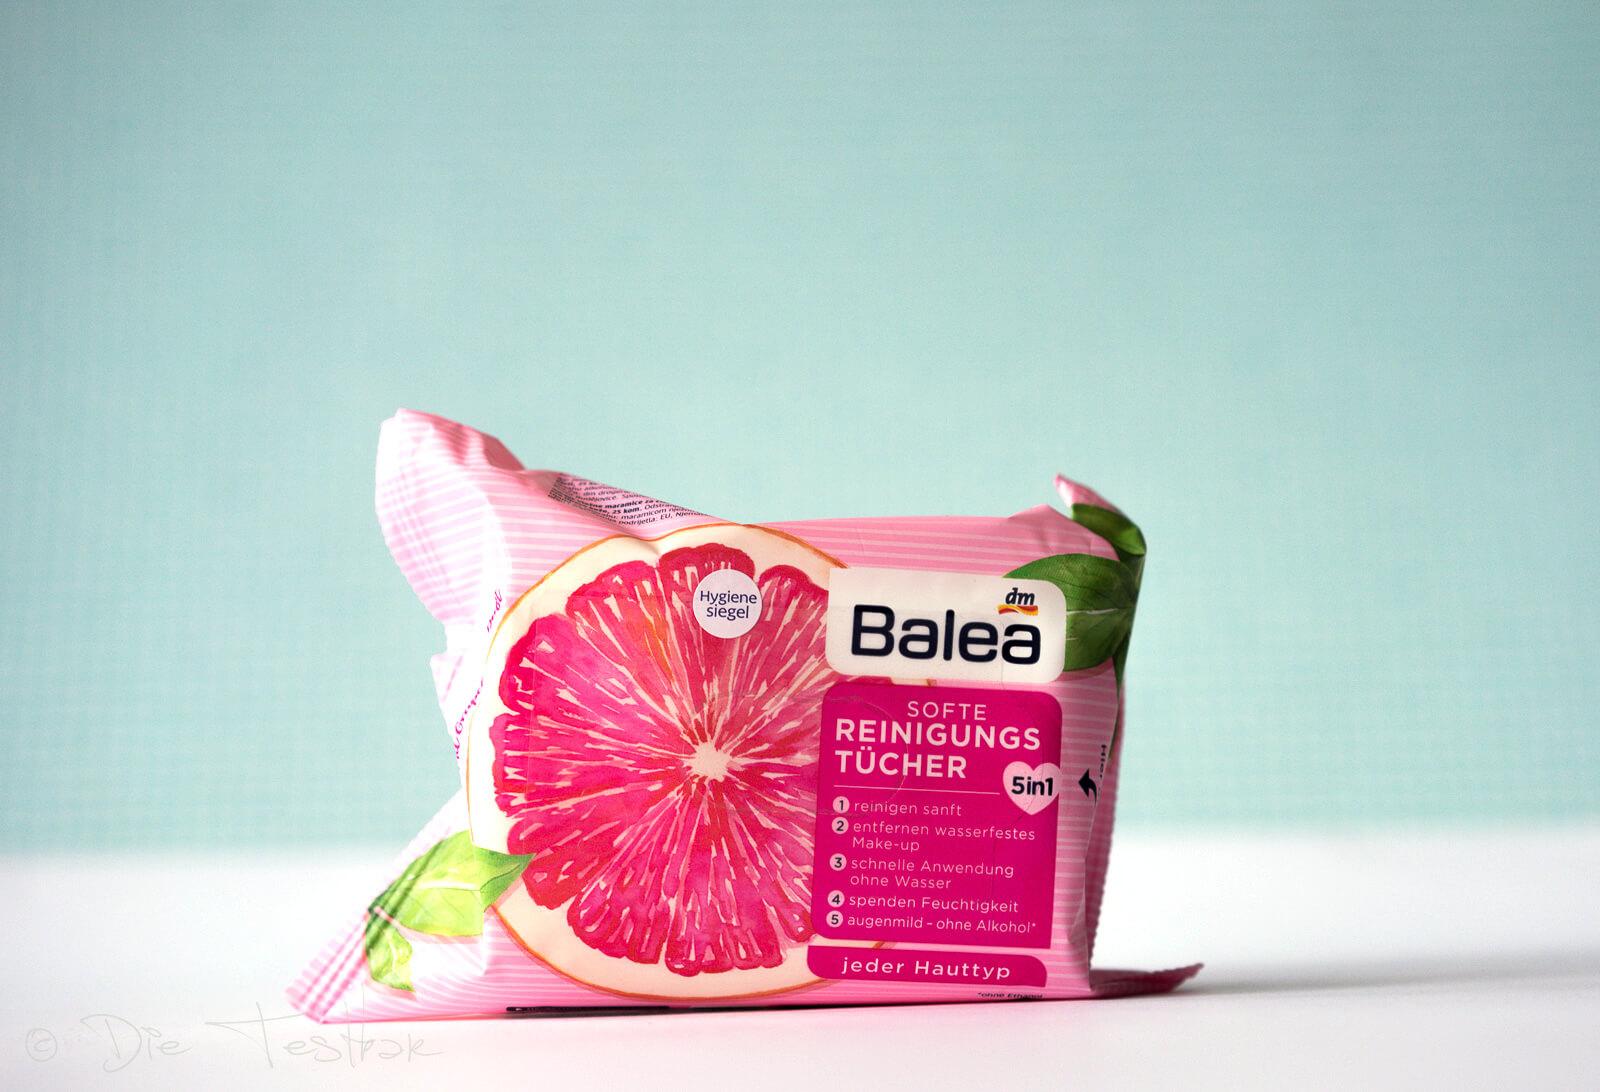 BALEA - Softe Reiningungstücher